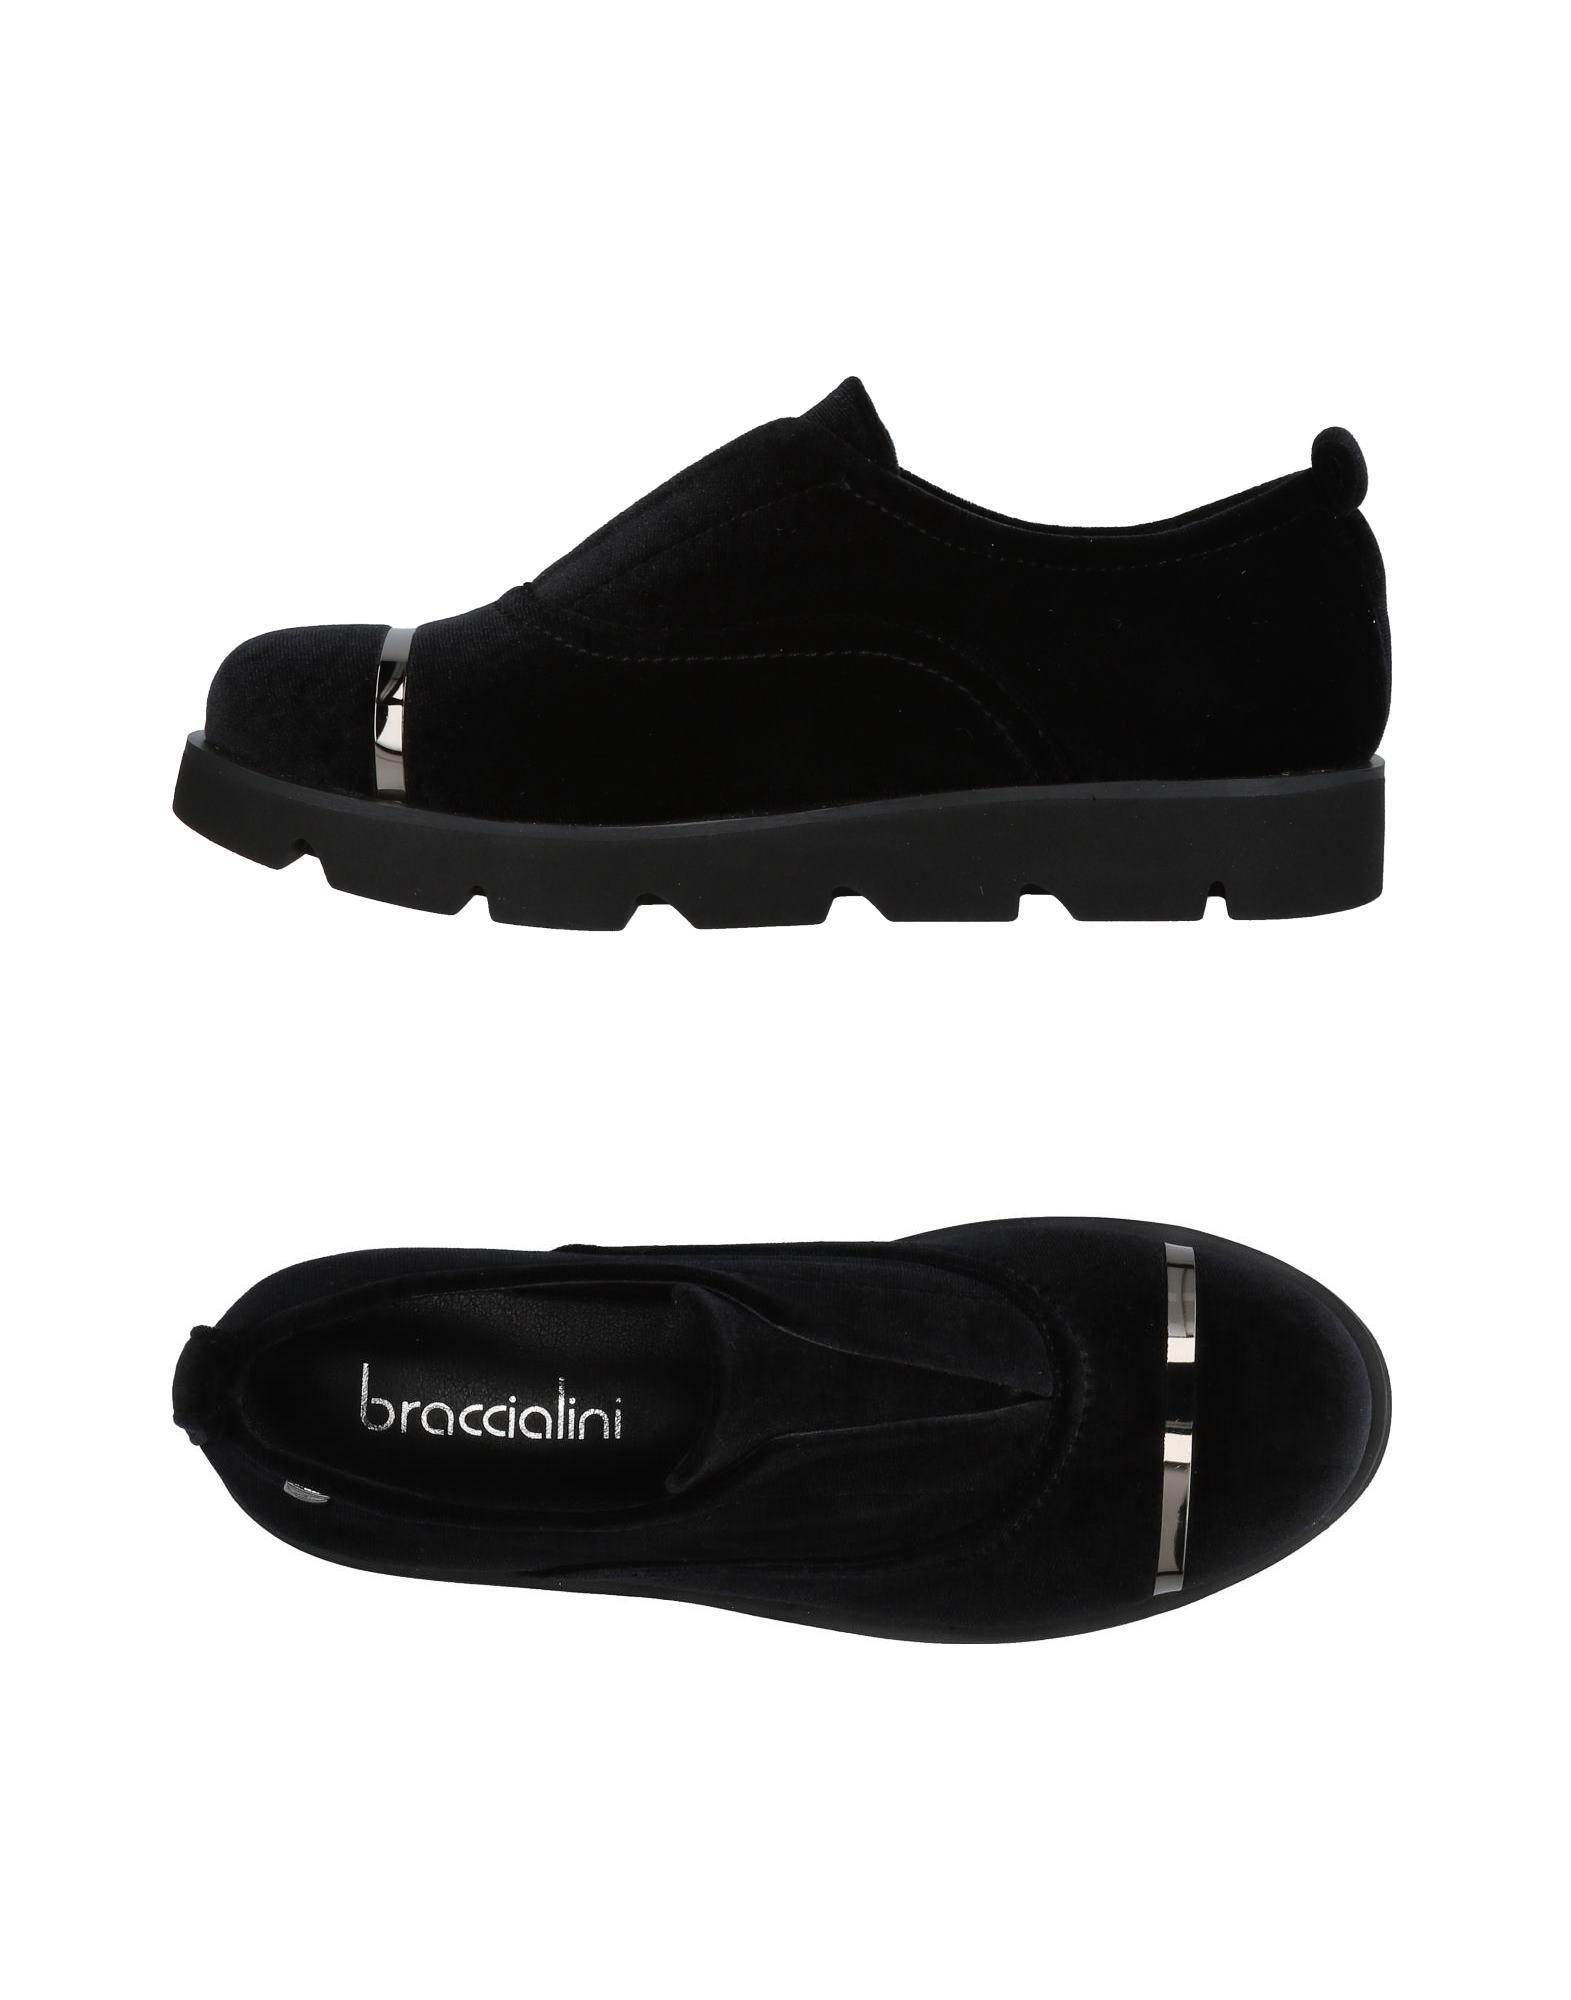 TUA BY BRACCIALINI Низкие кеды и кроссовки am pm by bottega backdoor низкие кеды и кроссовки